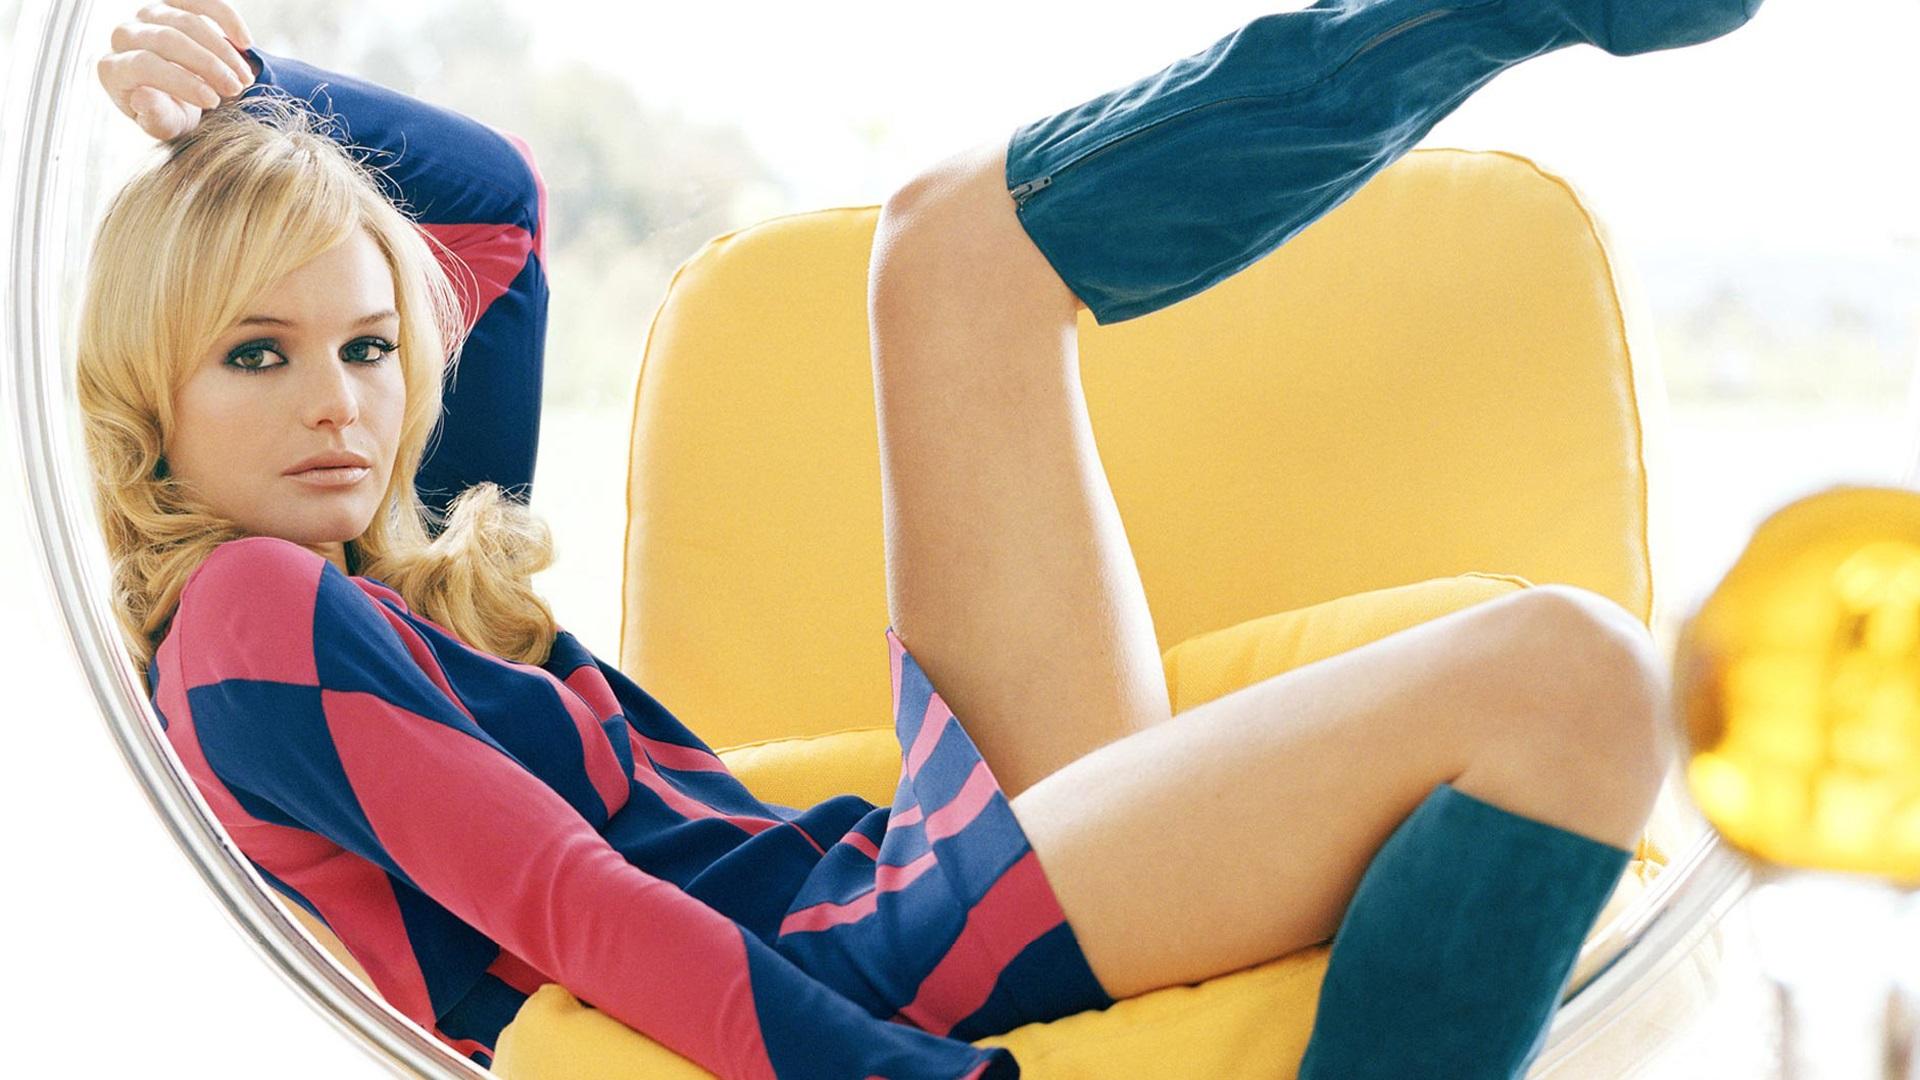 kate bosworth 01 wallp... Kate Bosworth